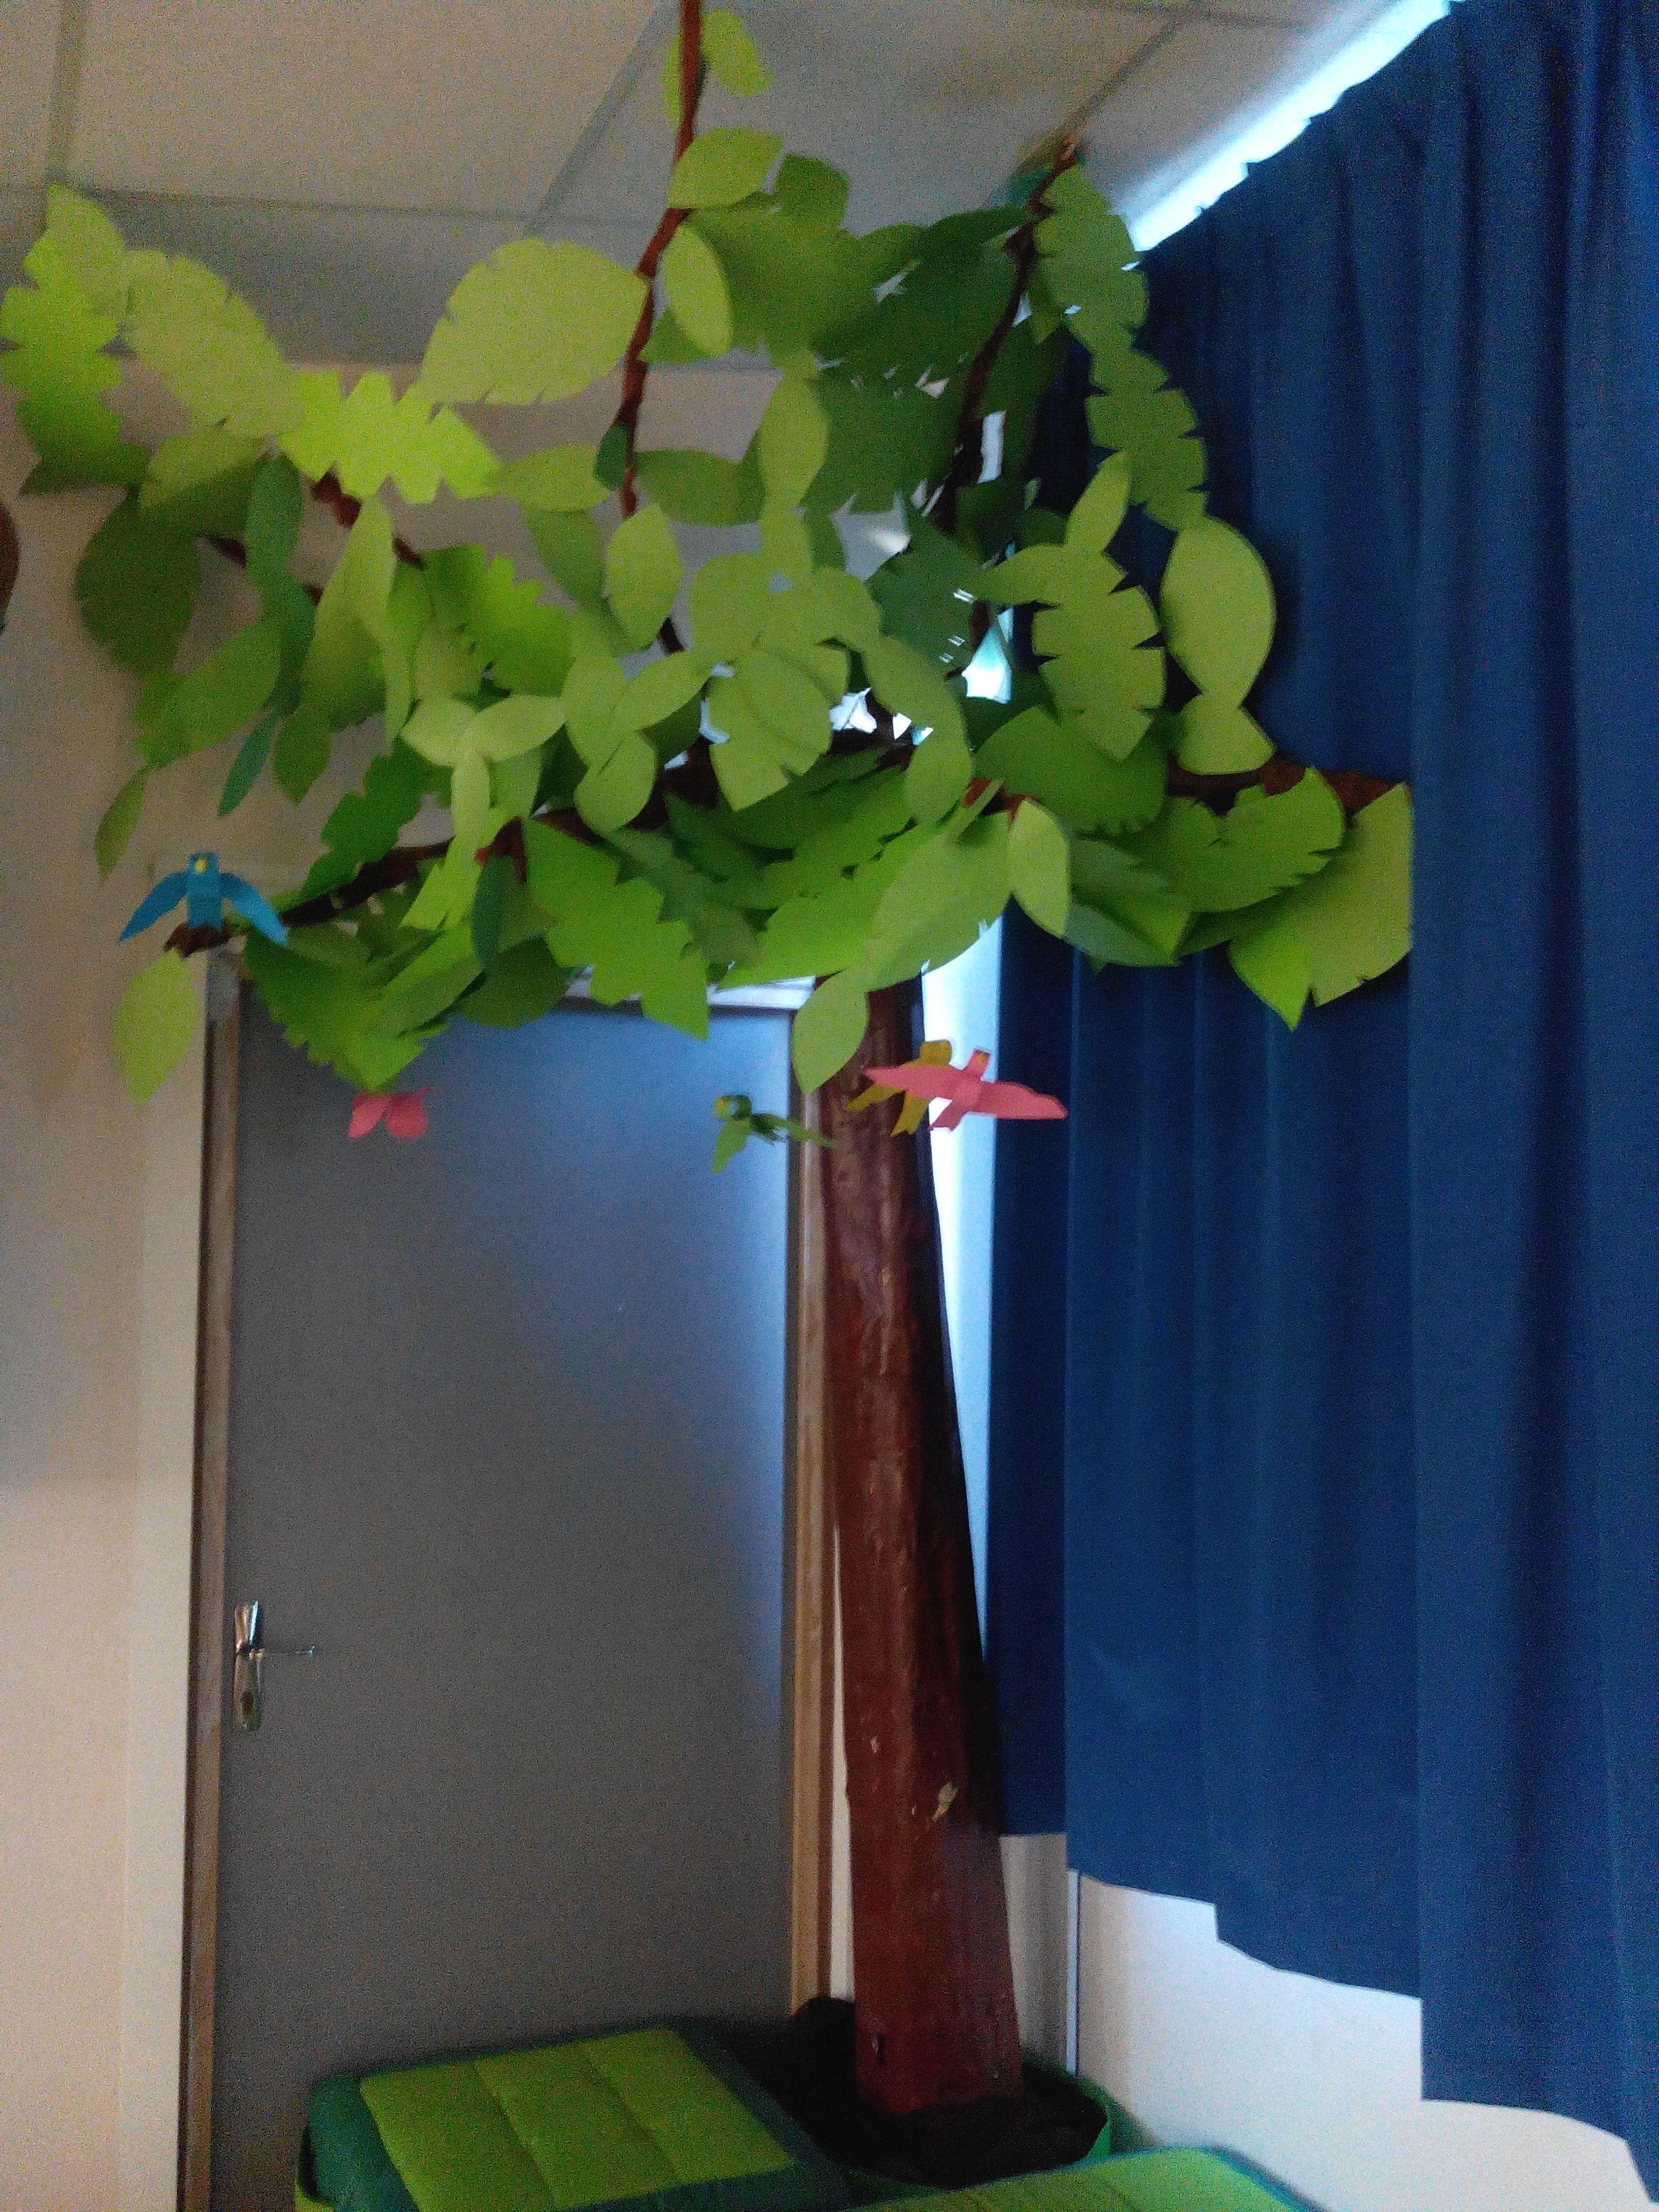 Un arbre est n tube de carton journaux un vieux - Arbre de noel en carton ...